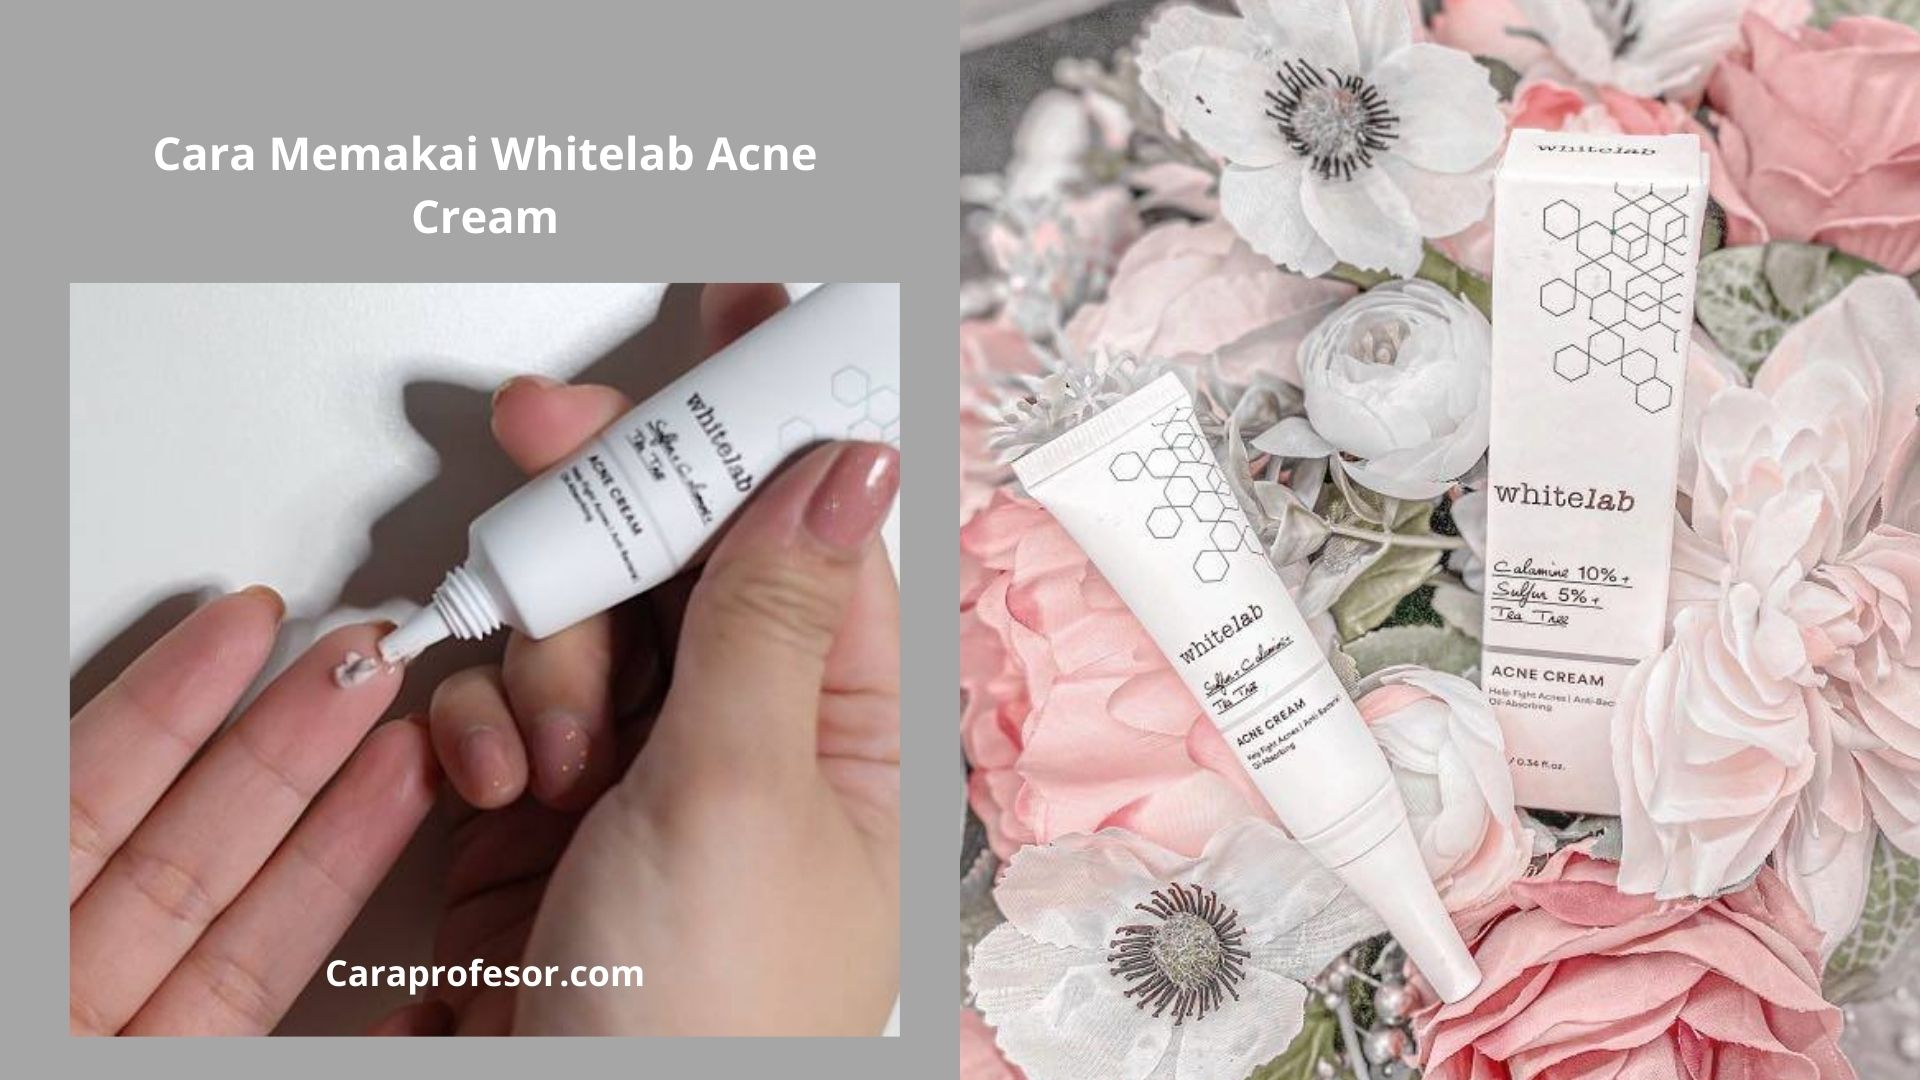 Cara Memakai Whitelab Acne Cream